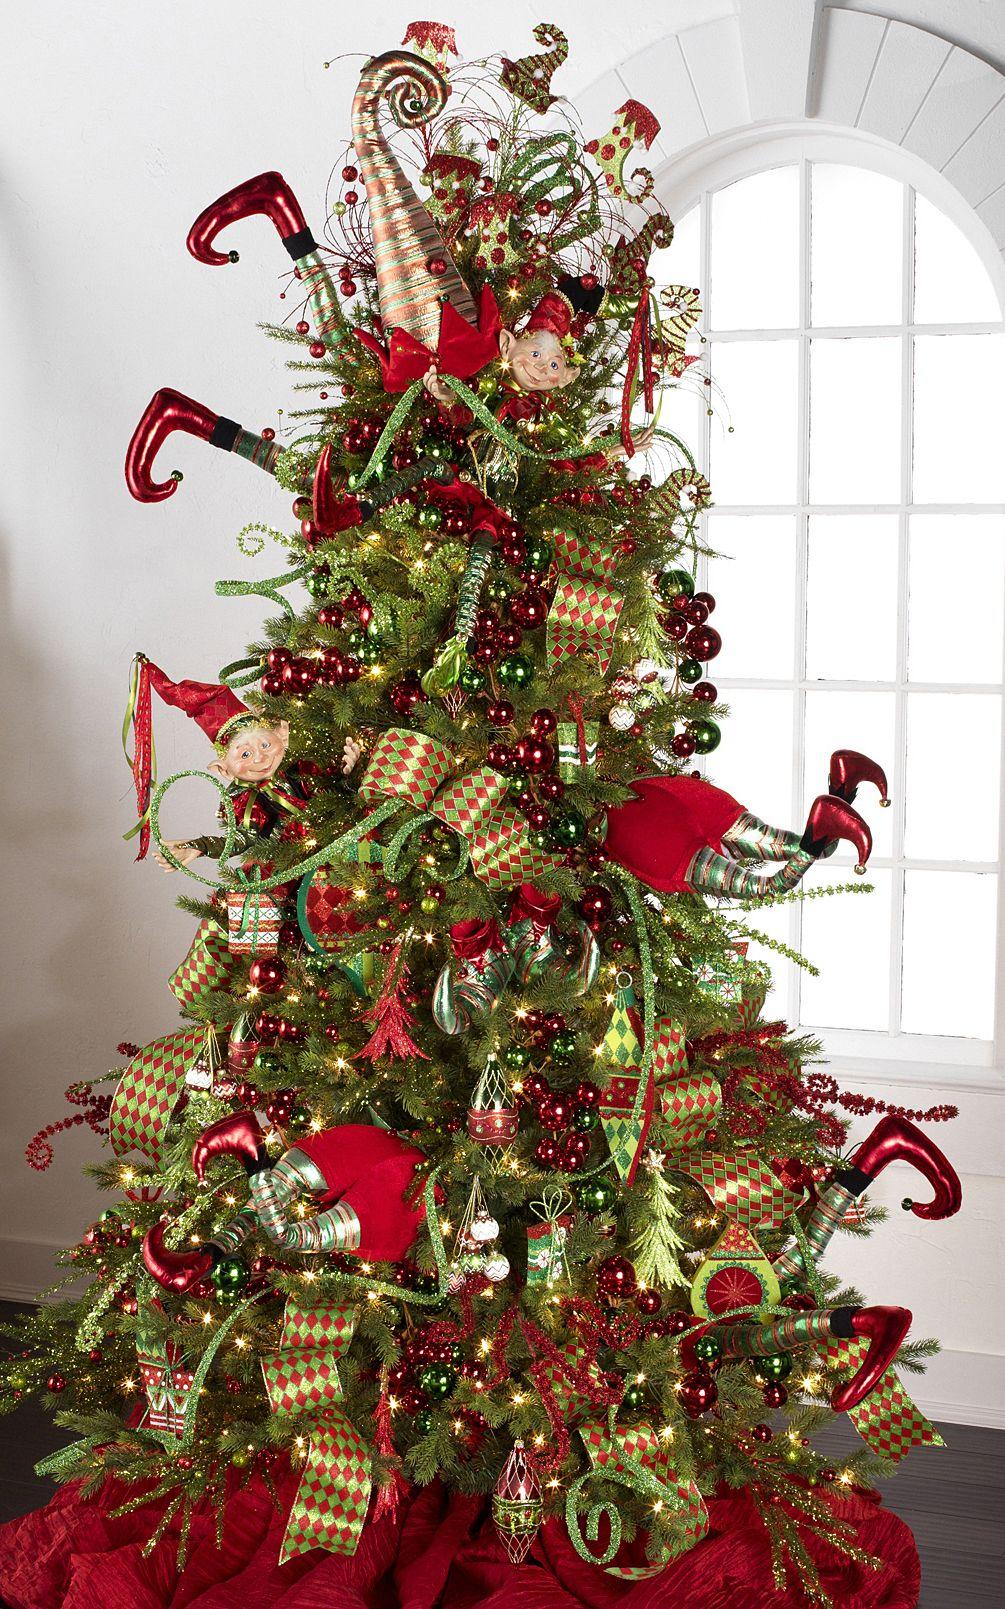 RAZ Imports 2015 - Merry! Merry! Merry! Tree | Whimsical ...